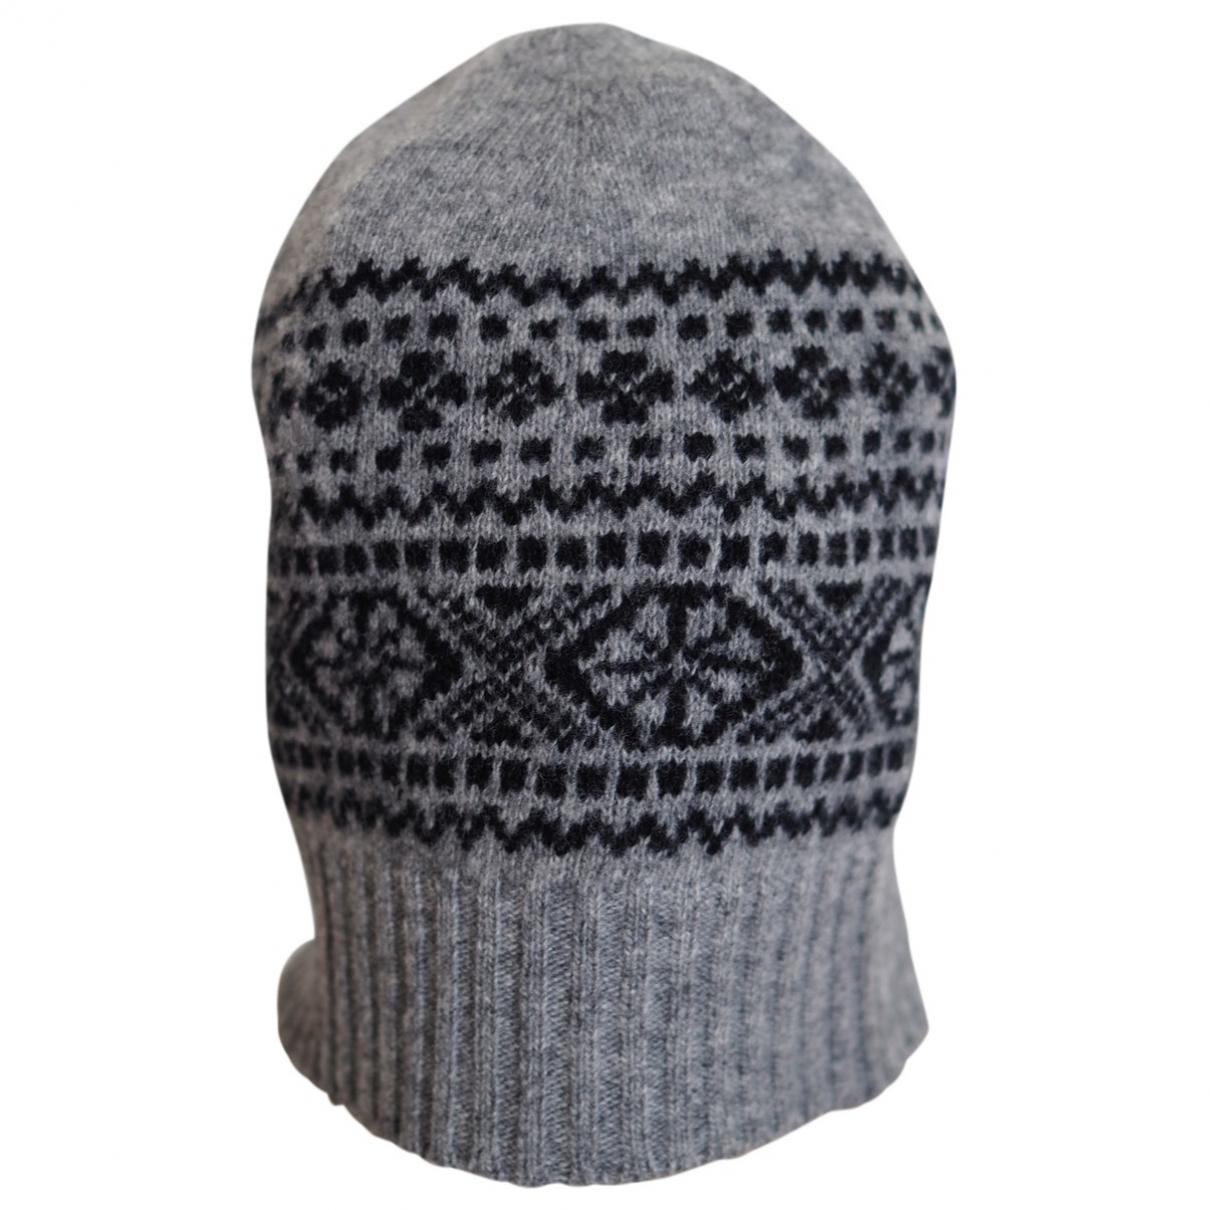 Burberry \N Hut, Muetzen in  Grau Wolle